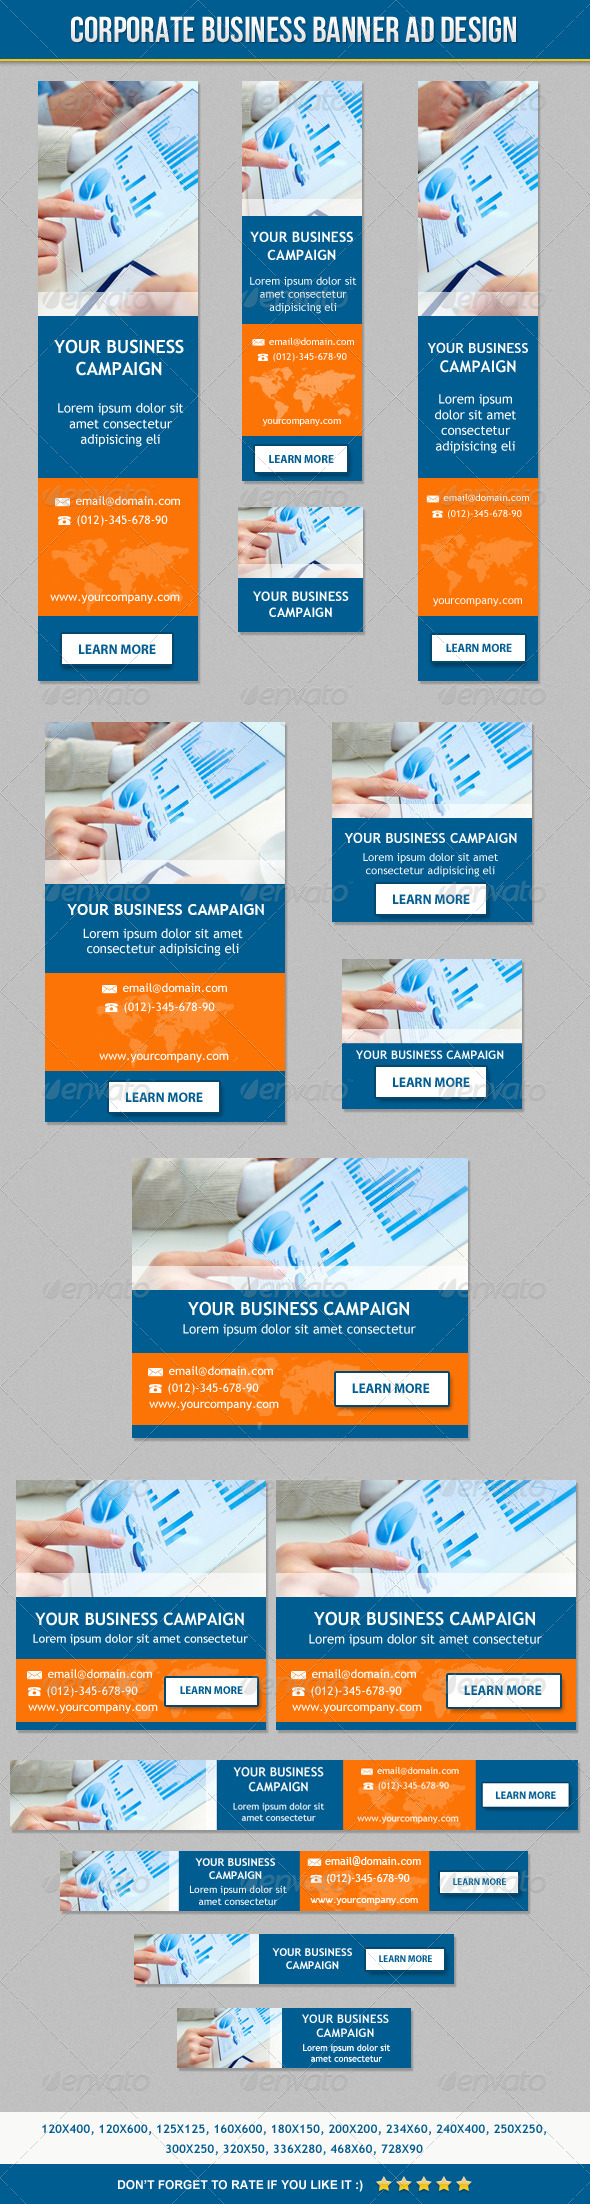 GraphicRiver Corporate Business Banner ad Design 6505958